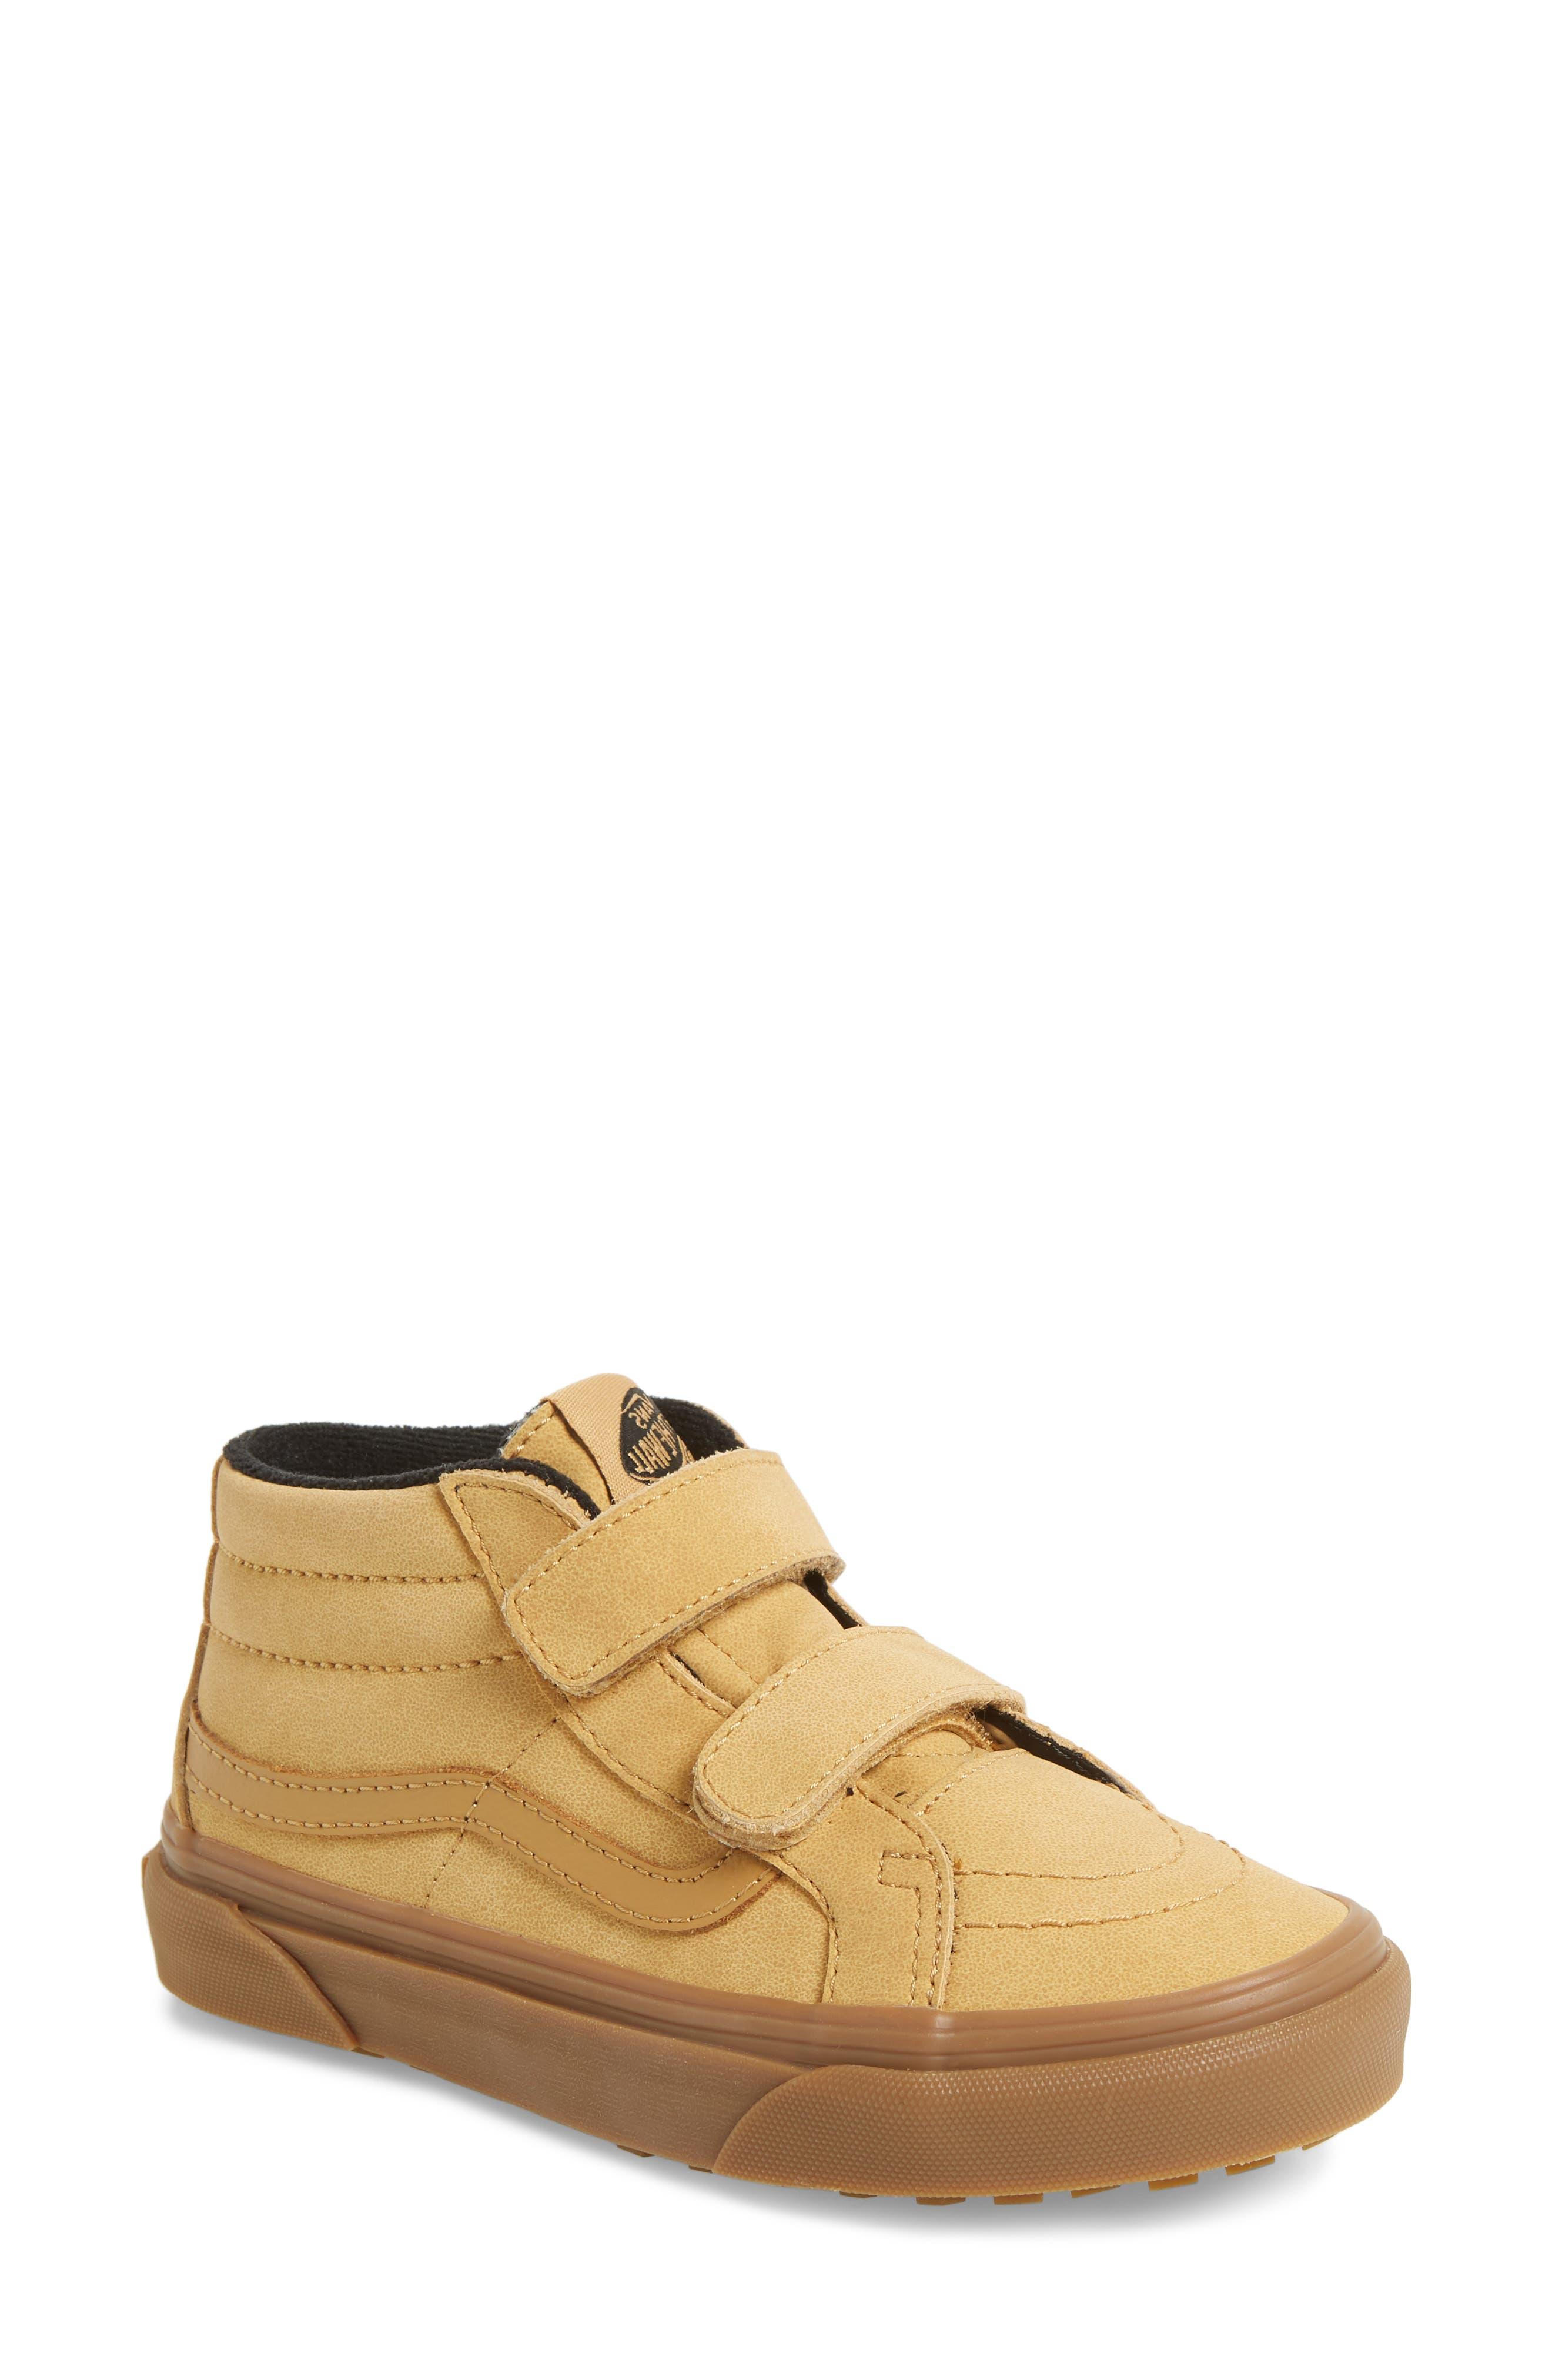 VANS Sk8-Mid Reissue V Sneaker, Main, color, VANSBUCK/ APPLE CINNAMON